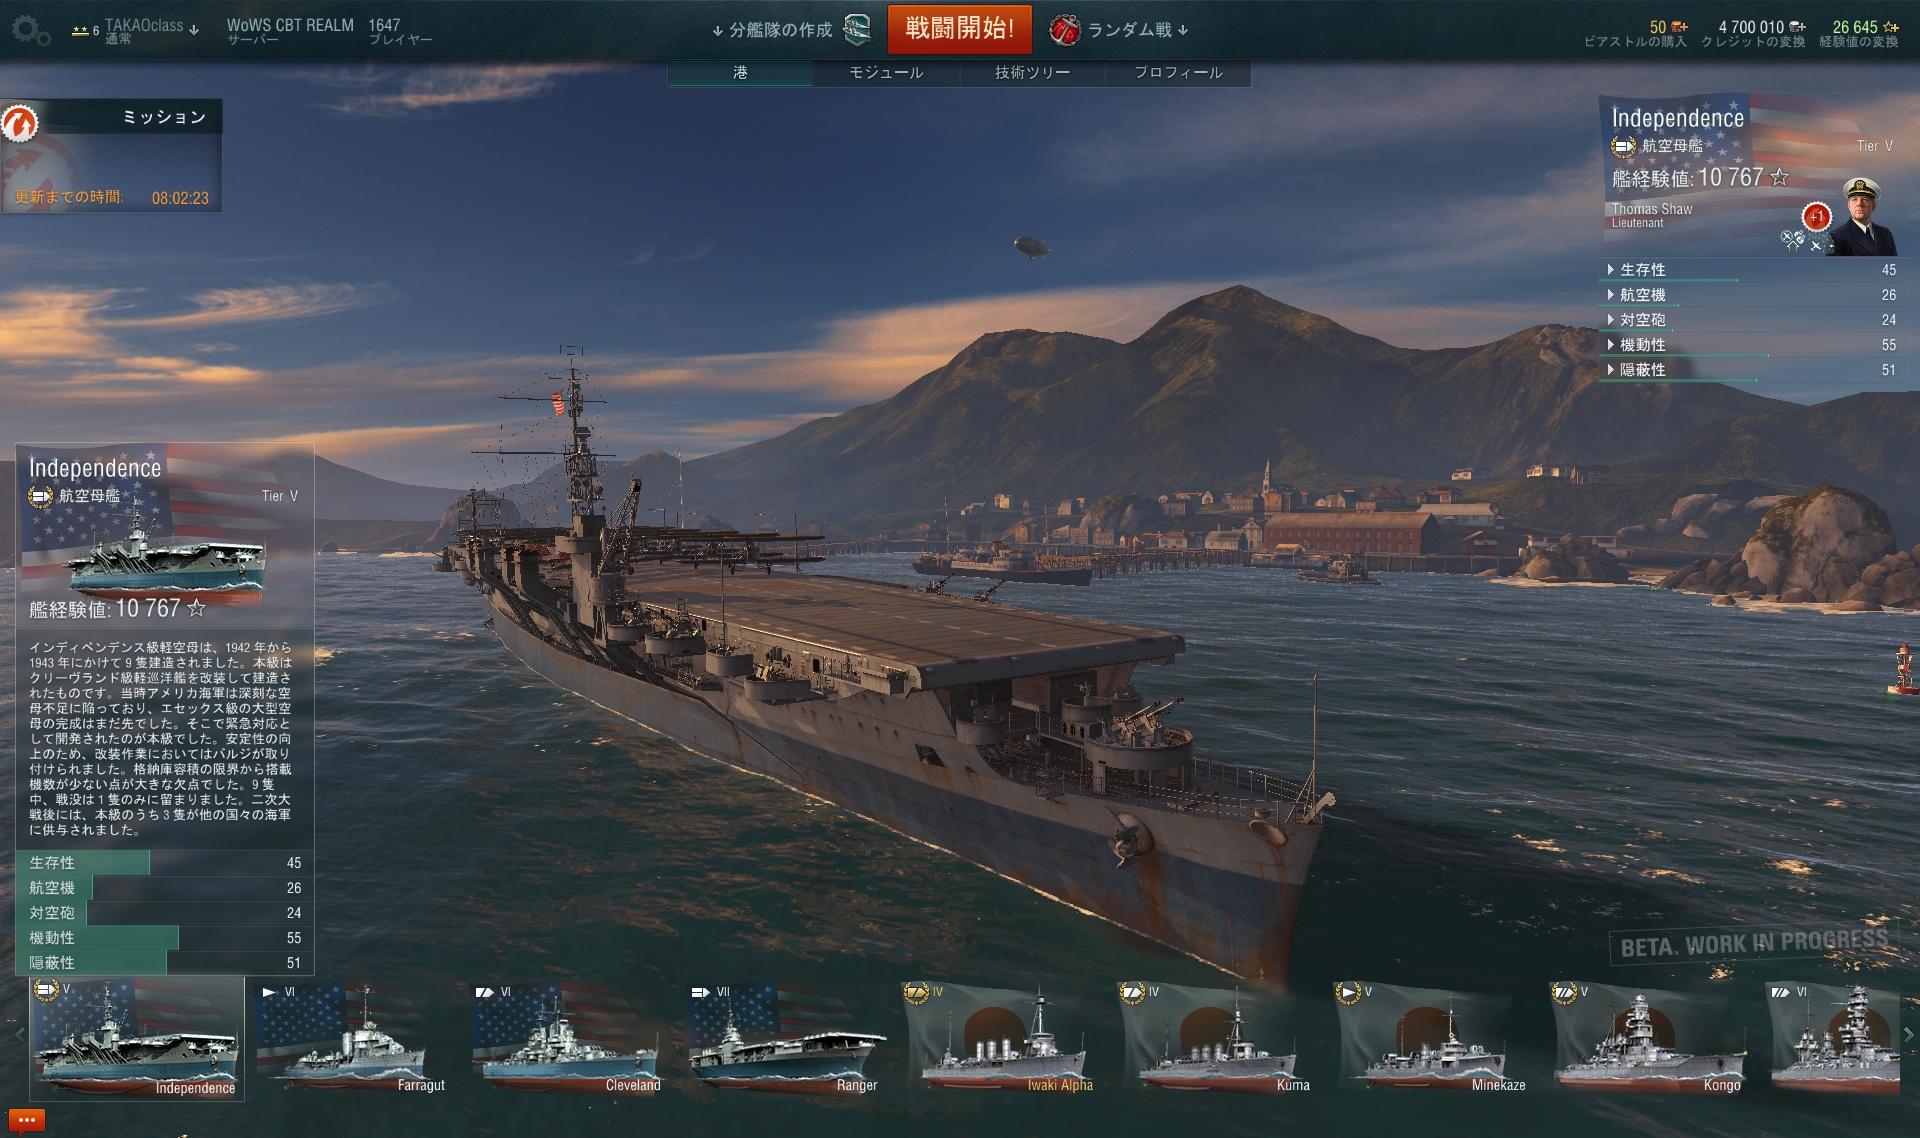 [W.o.WS] 현재 굴리는 함선들